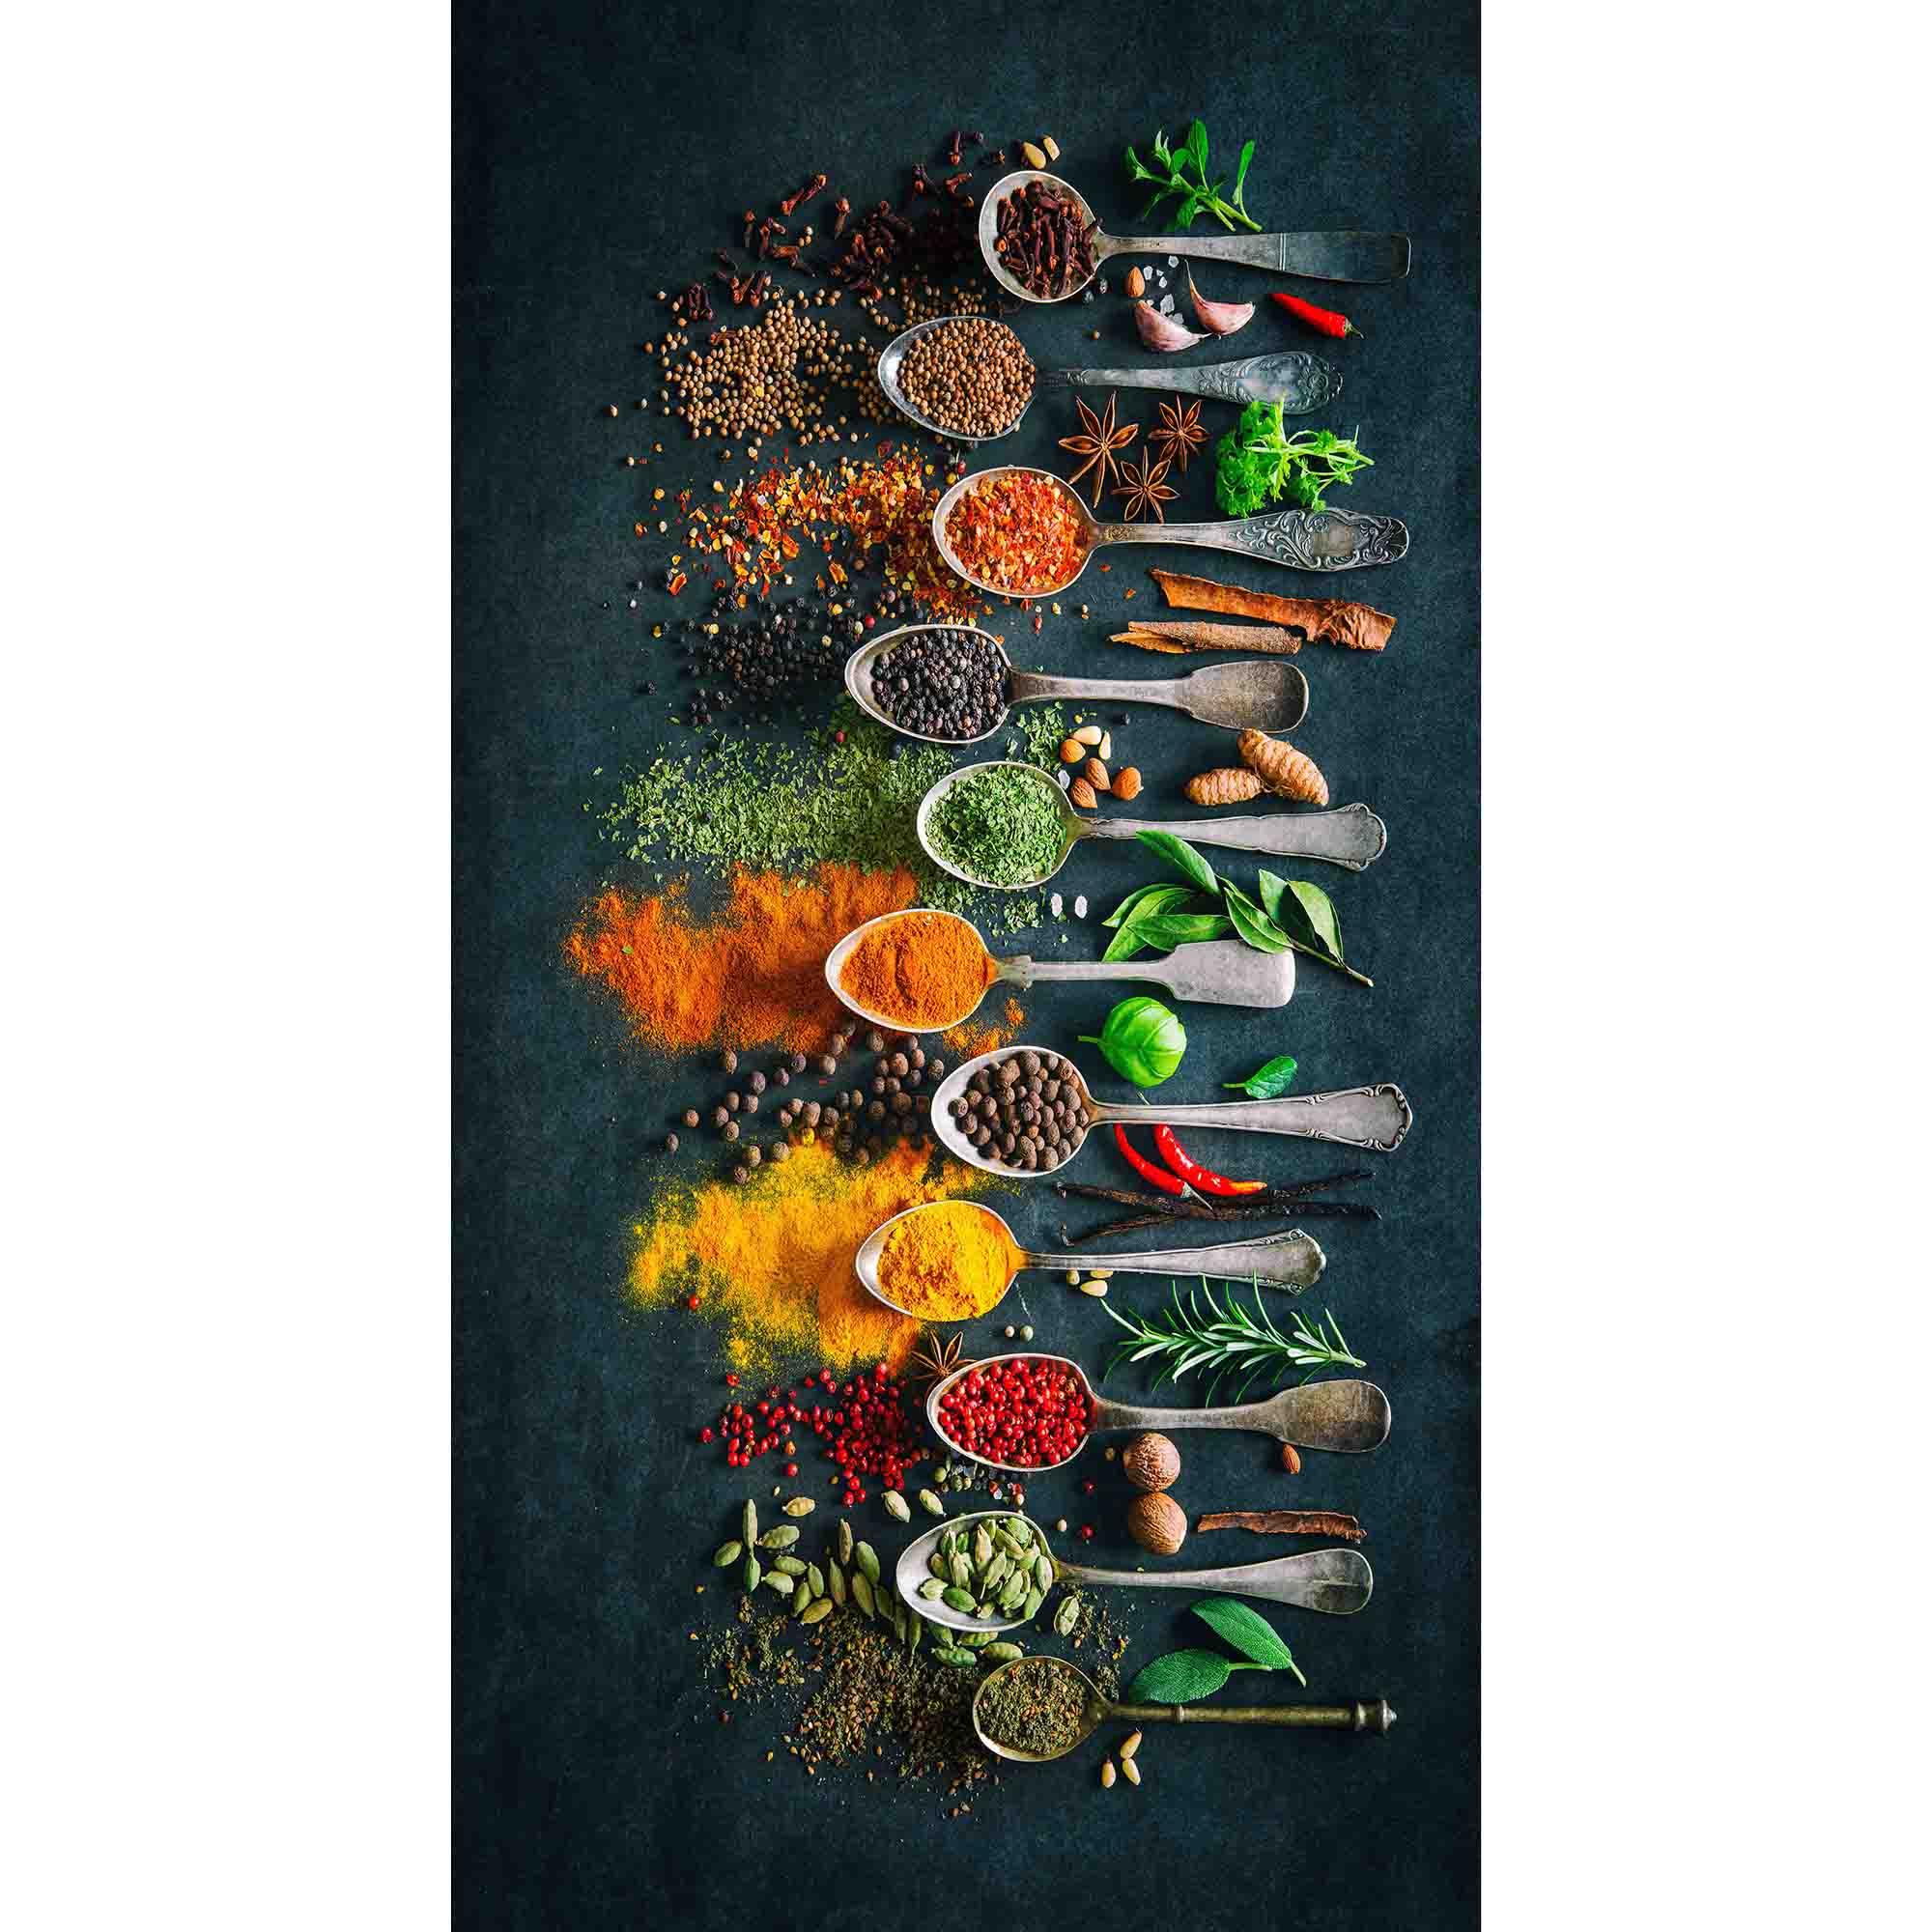 Fotografie Covor cu print digital bucatarie Kring Banyo, 160X230 cm, 60% bumbac + 40% poliester, Negru